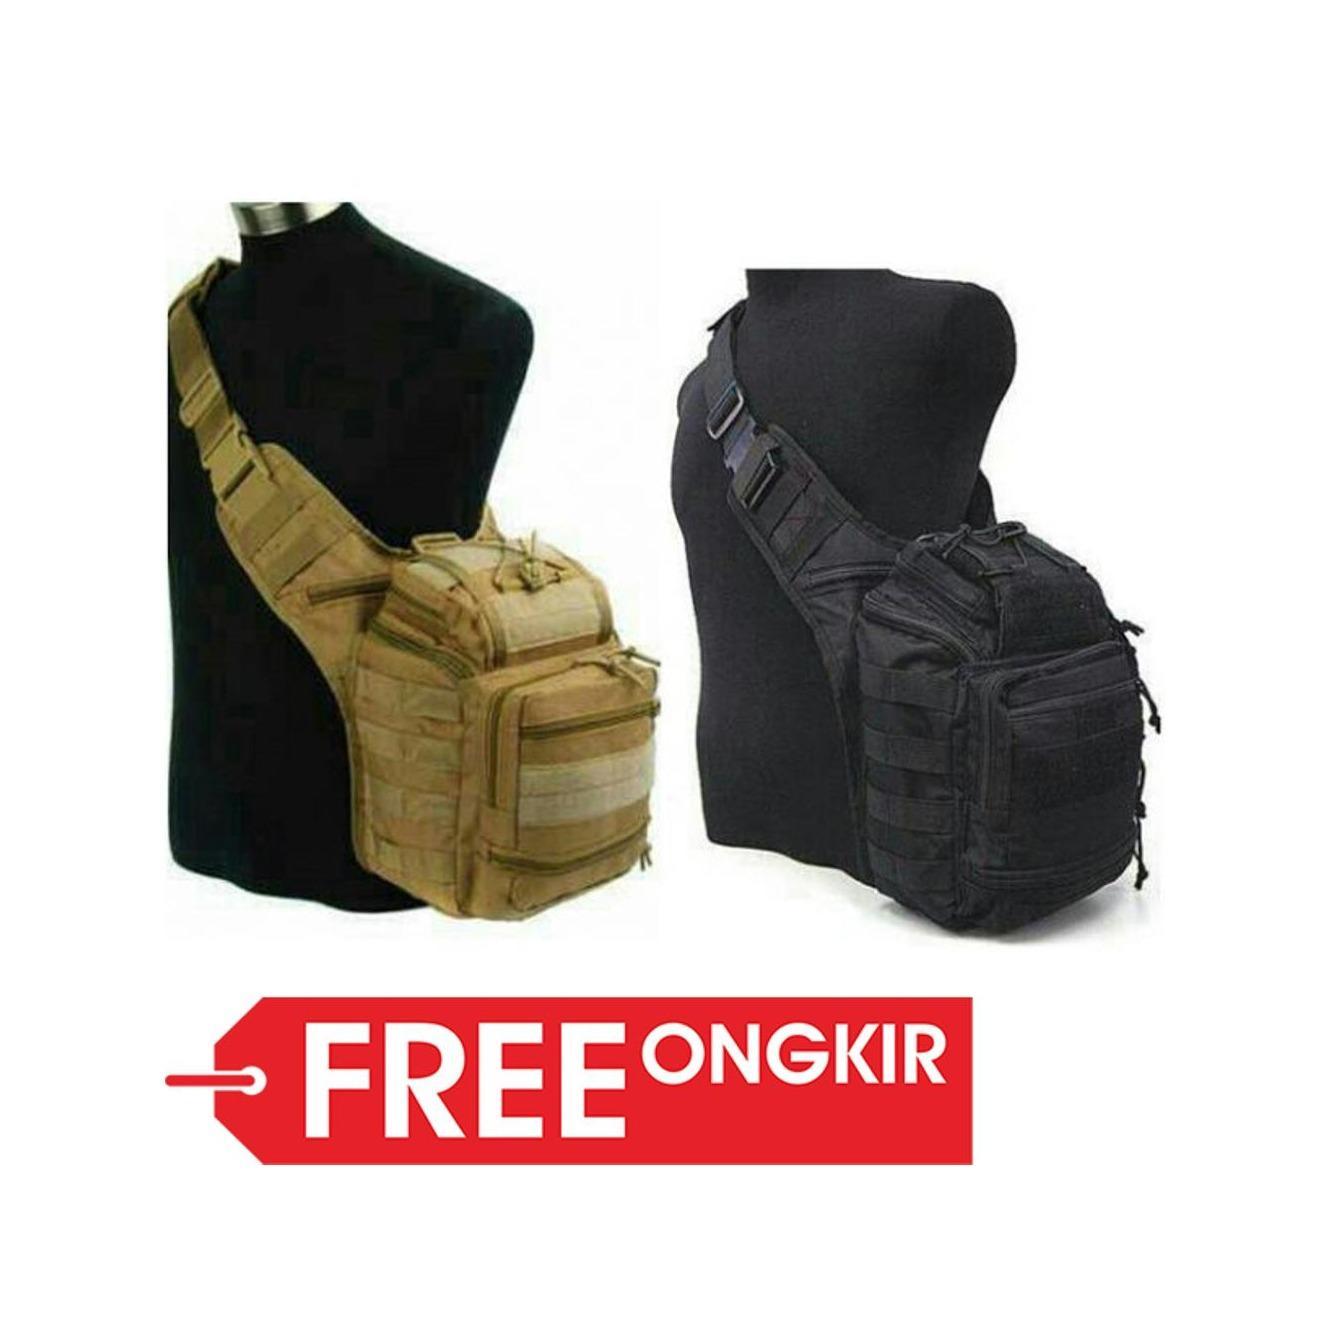 PROMO Tas Army Selempang Tactical Pria Type 803 Import (Side Bag, Militer, Polisi, Gurun, Tan, Pinggang, Kamera, Outdoor, Sport)